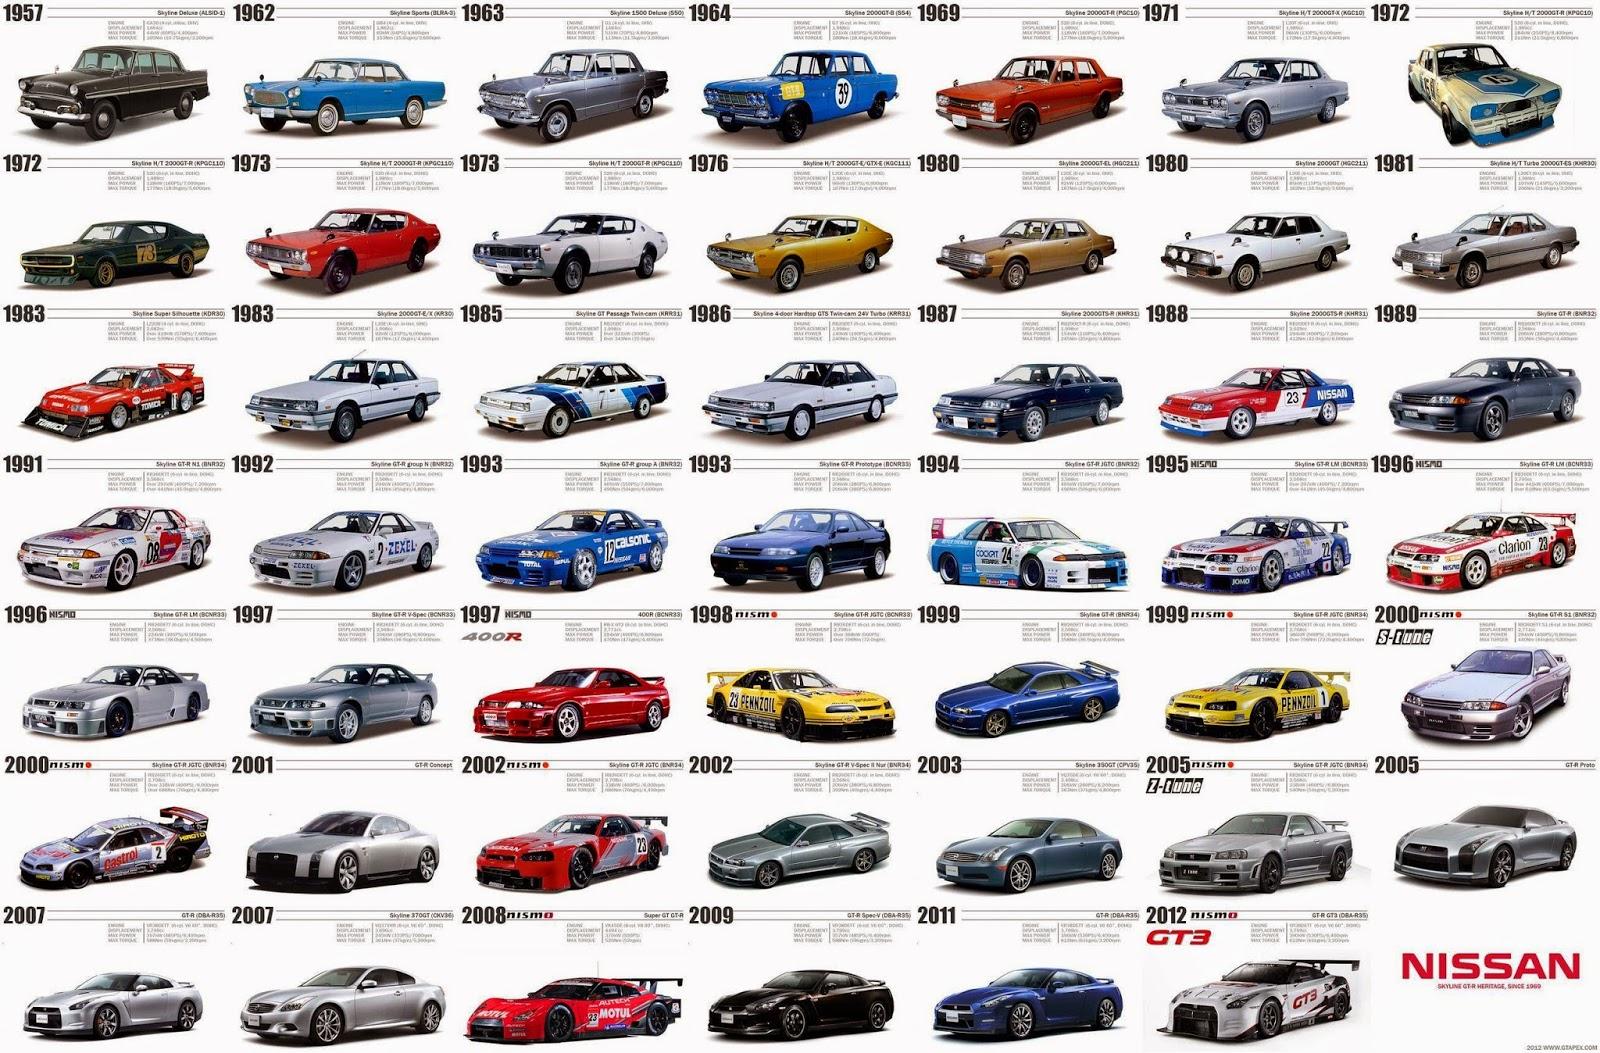 Model kereta Nissan